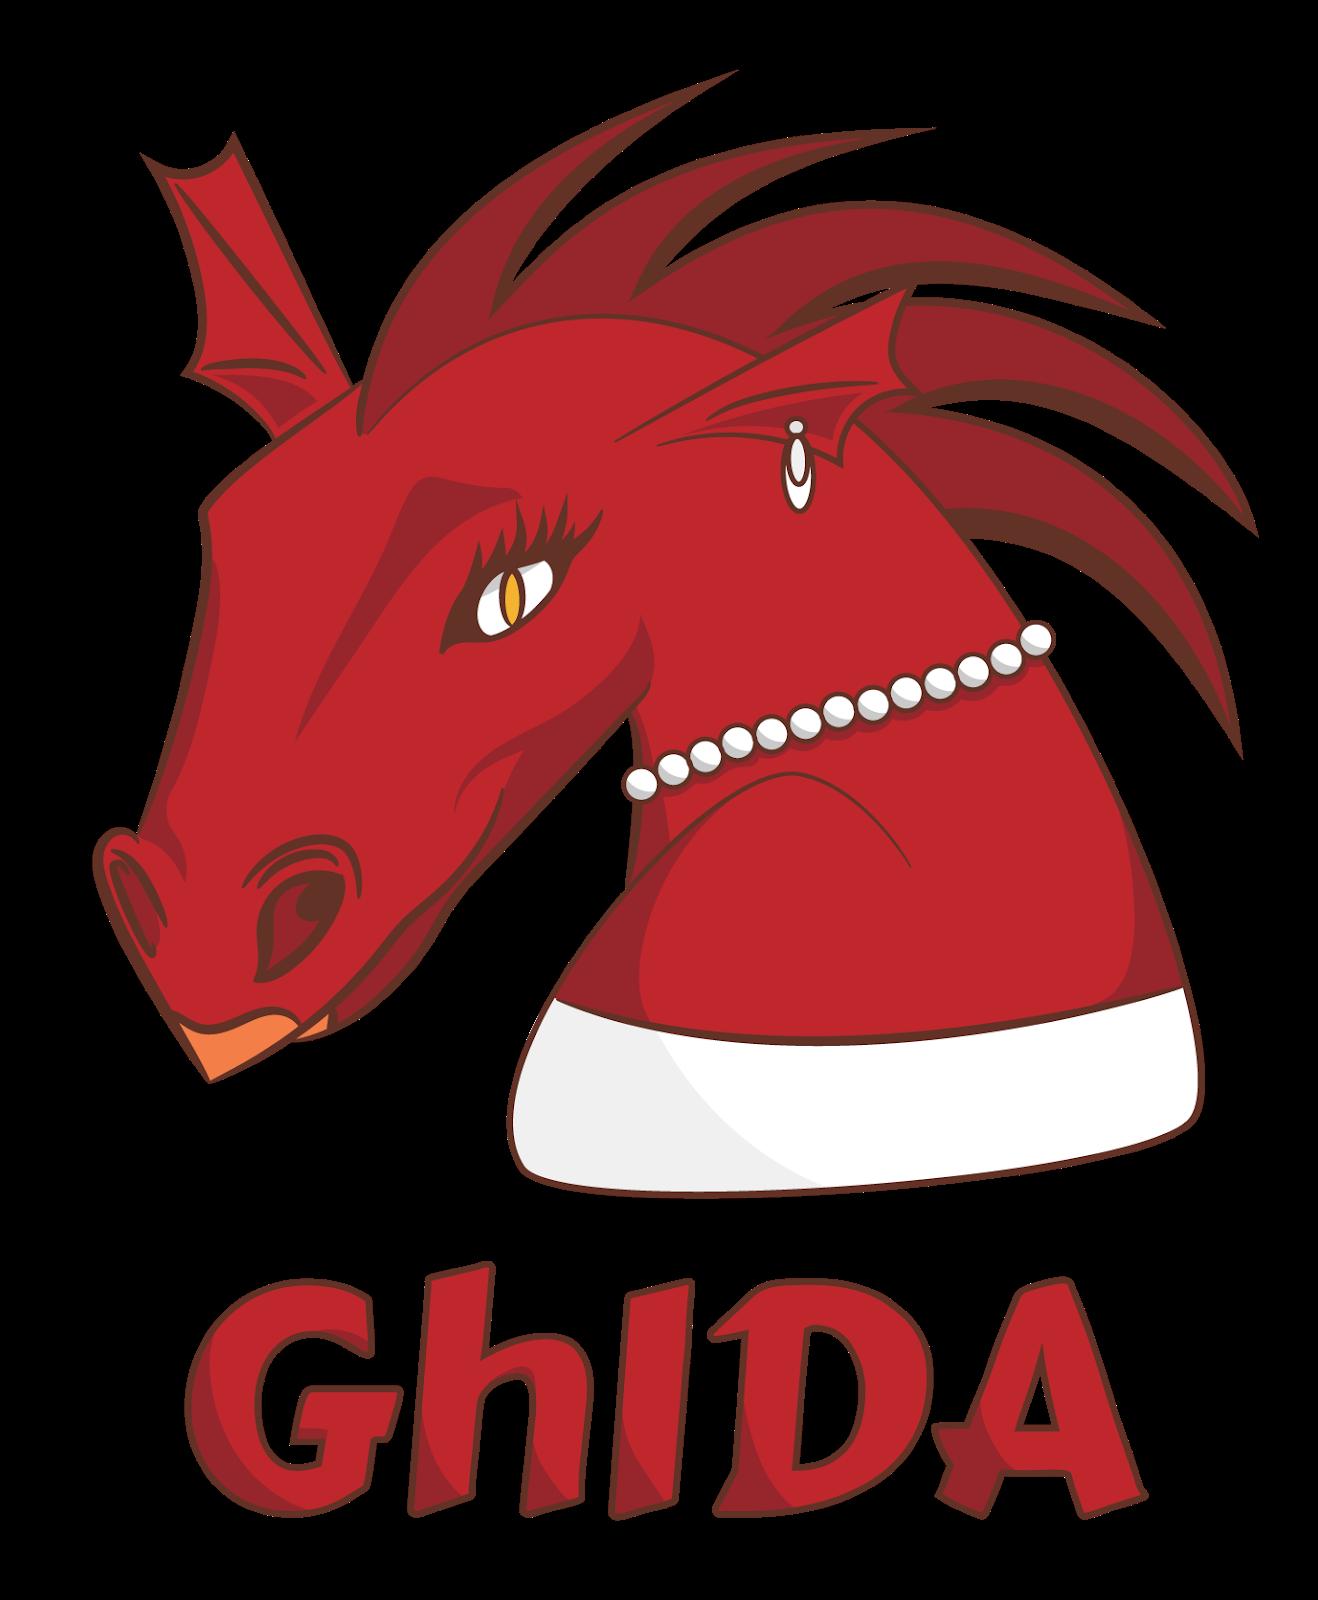 GhIDA: Ghidra decompiler for IDA Pro